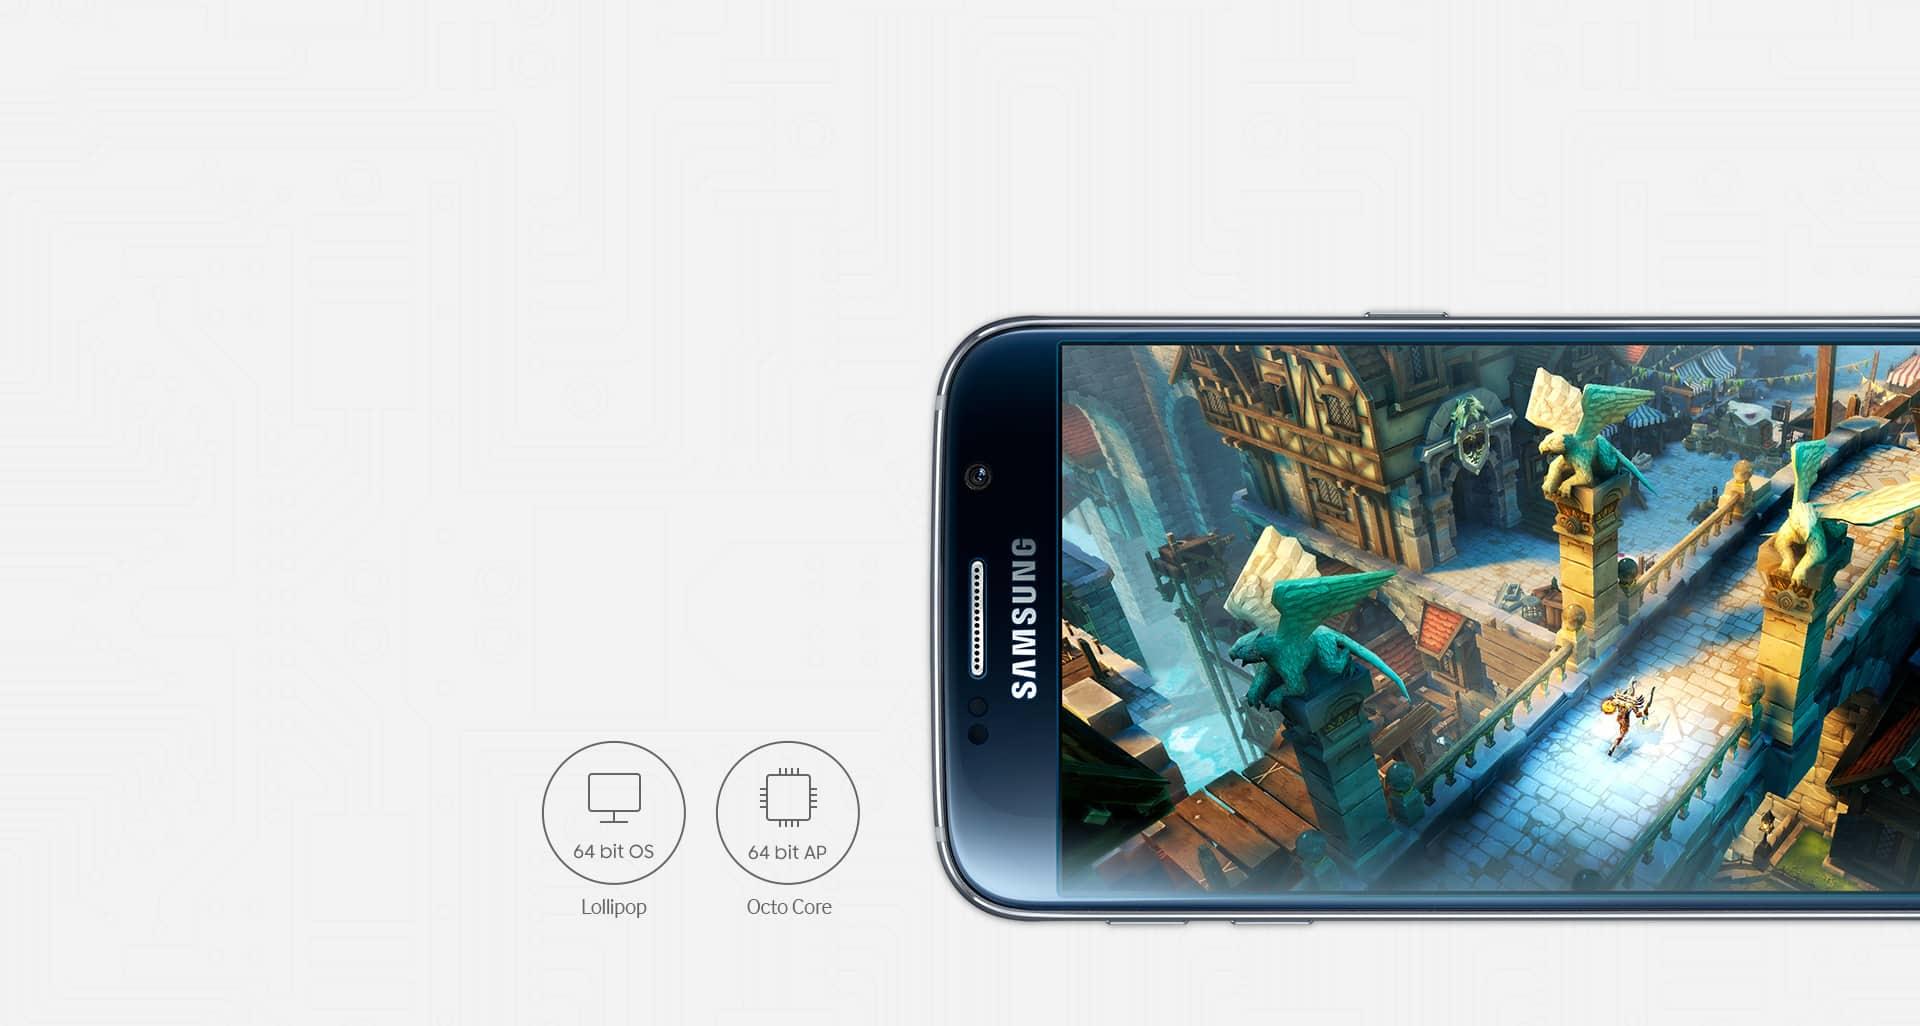 Processeur Galaxy S6